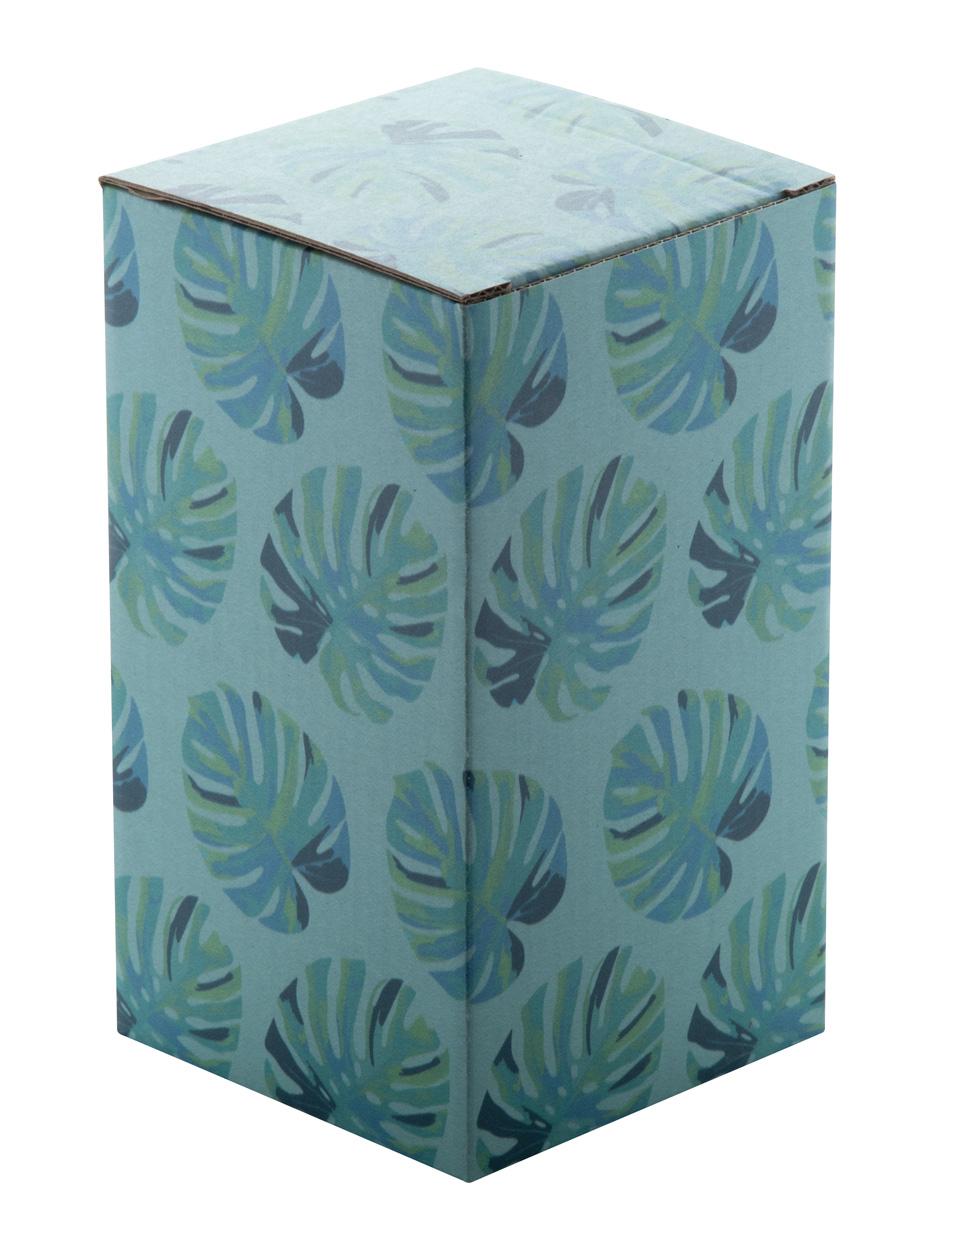 CreaBox Shaker A custom box